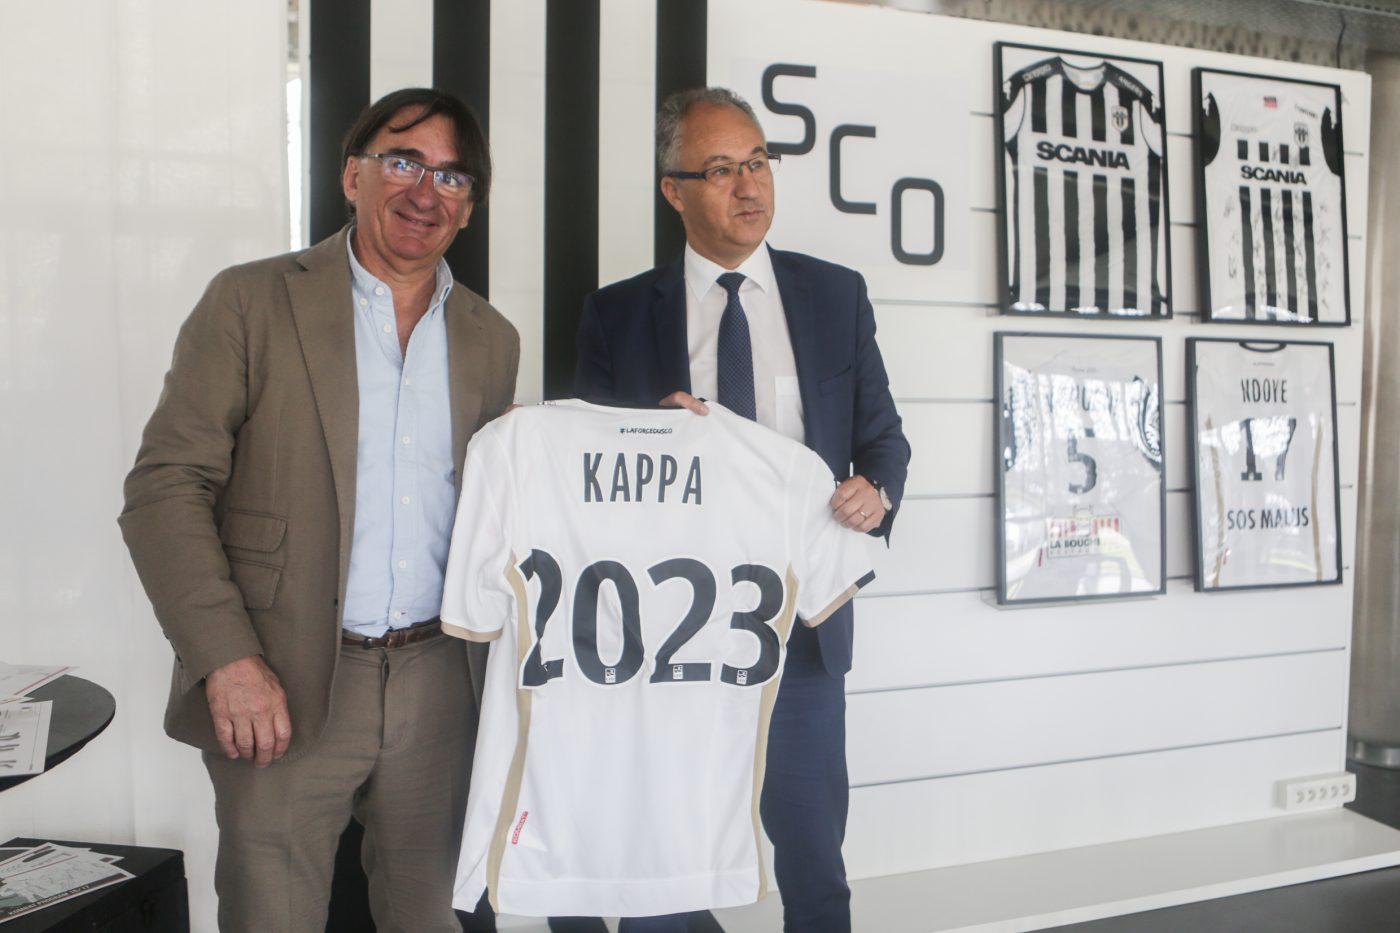 signature-prolongation-contrat-angers-sco-kappa-equipementier13